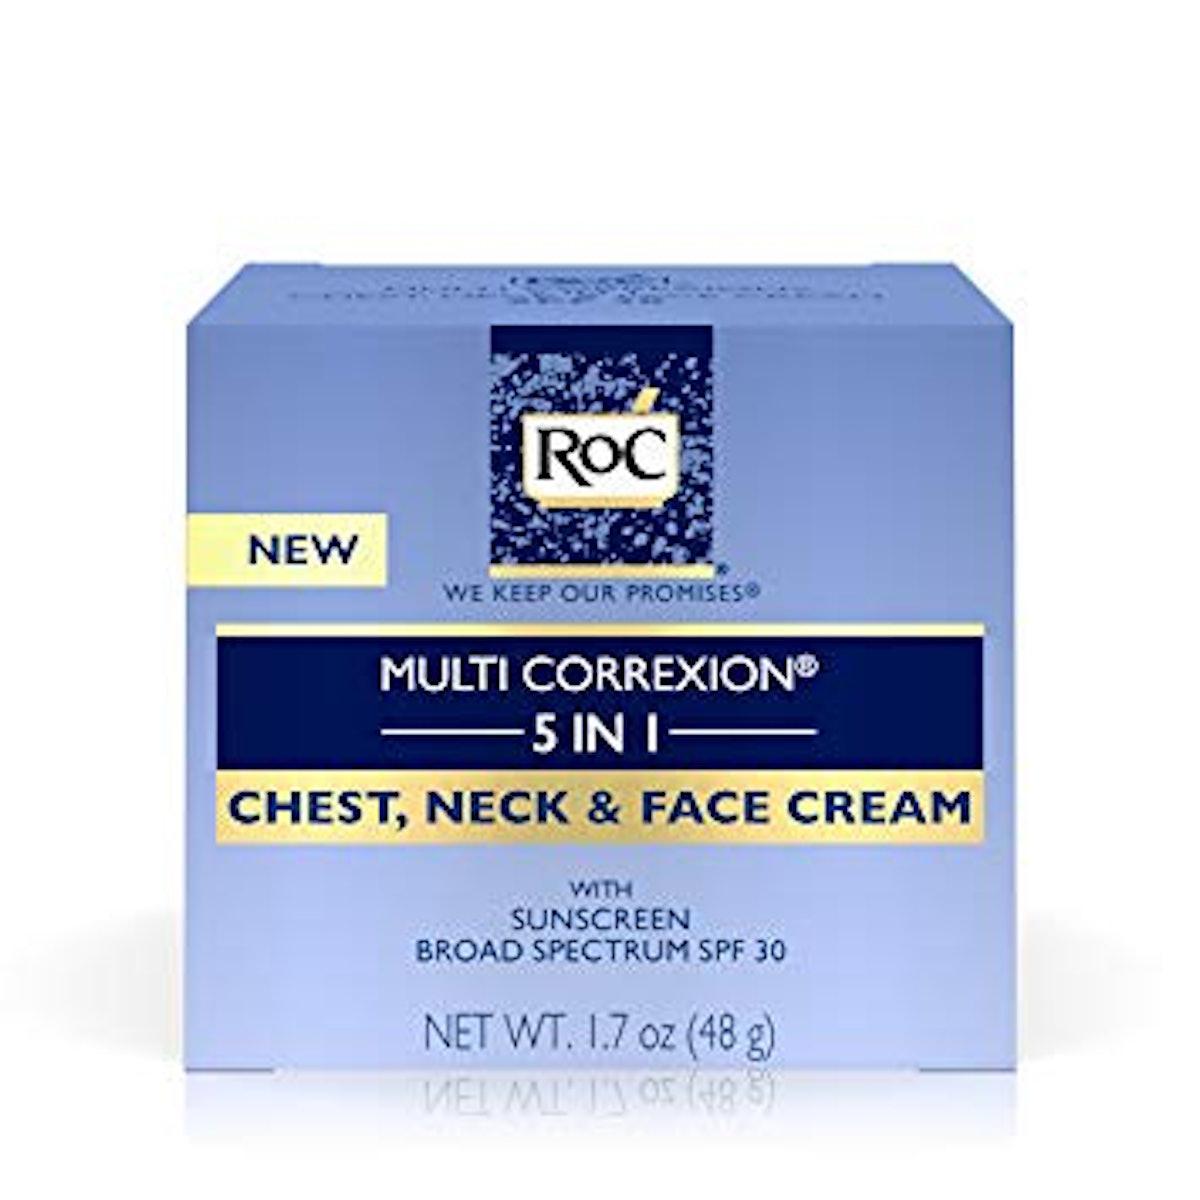 Chest, Neck & Face Cream SPF 30